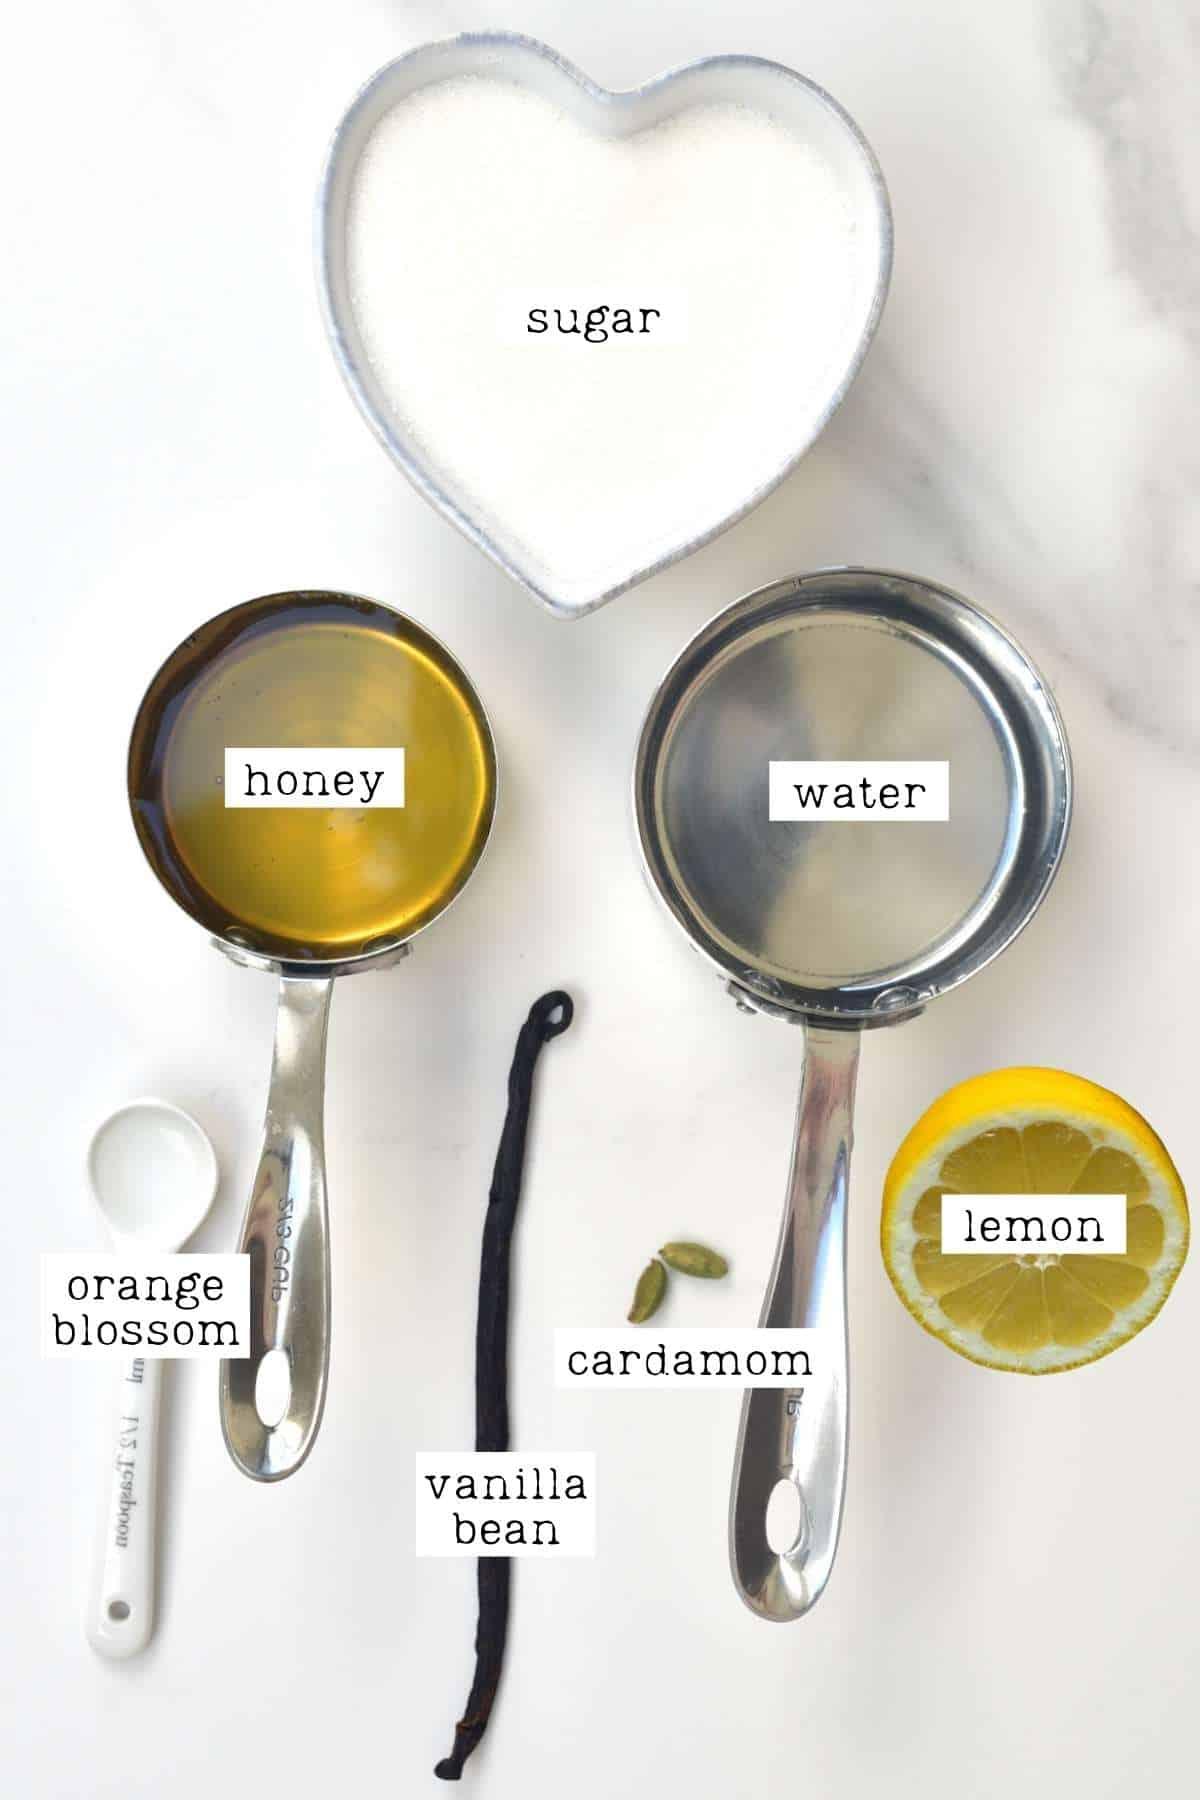 Ingredients for baklava sugar syrup